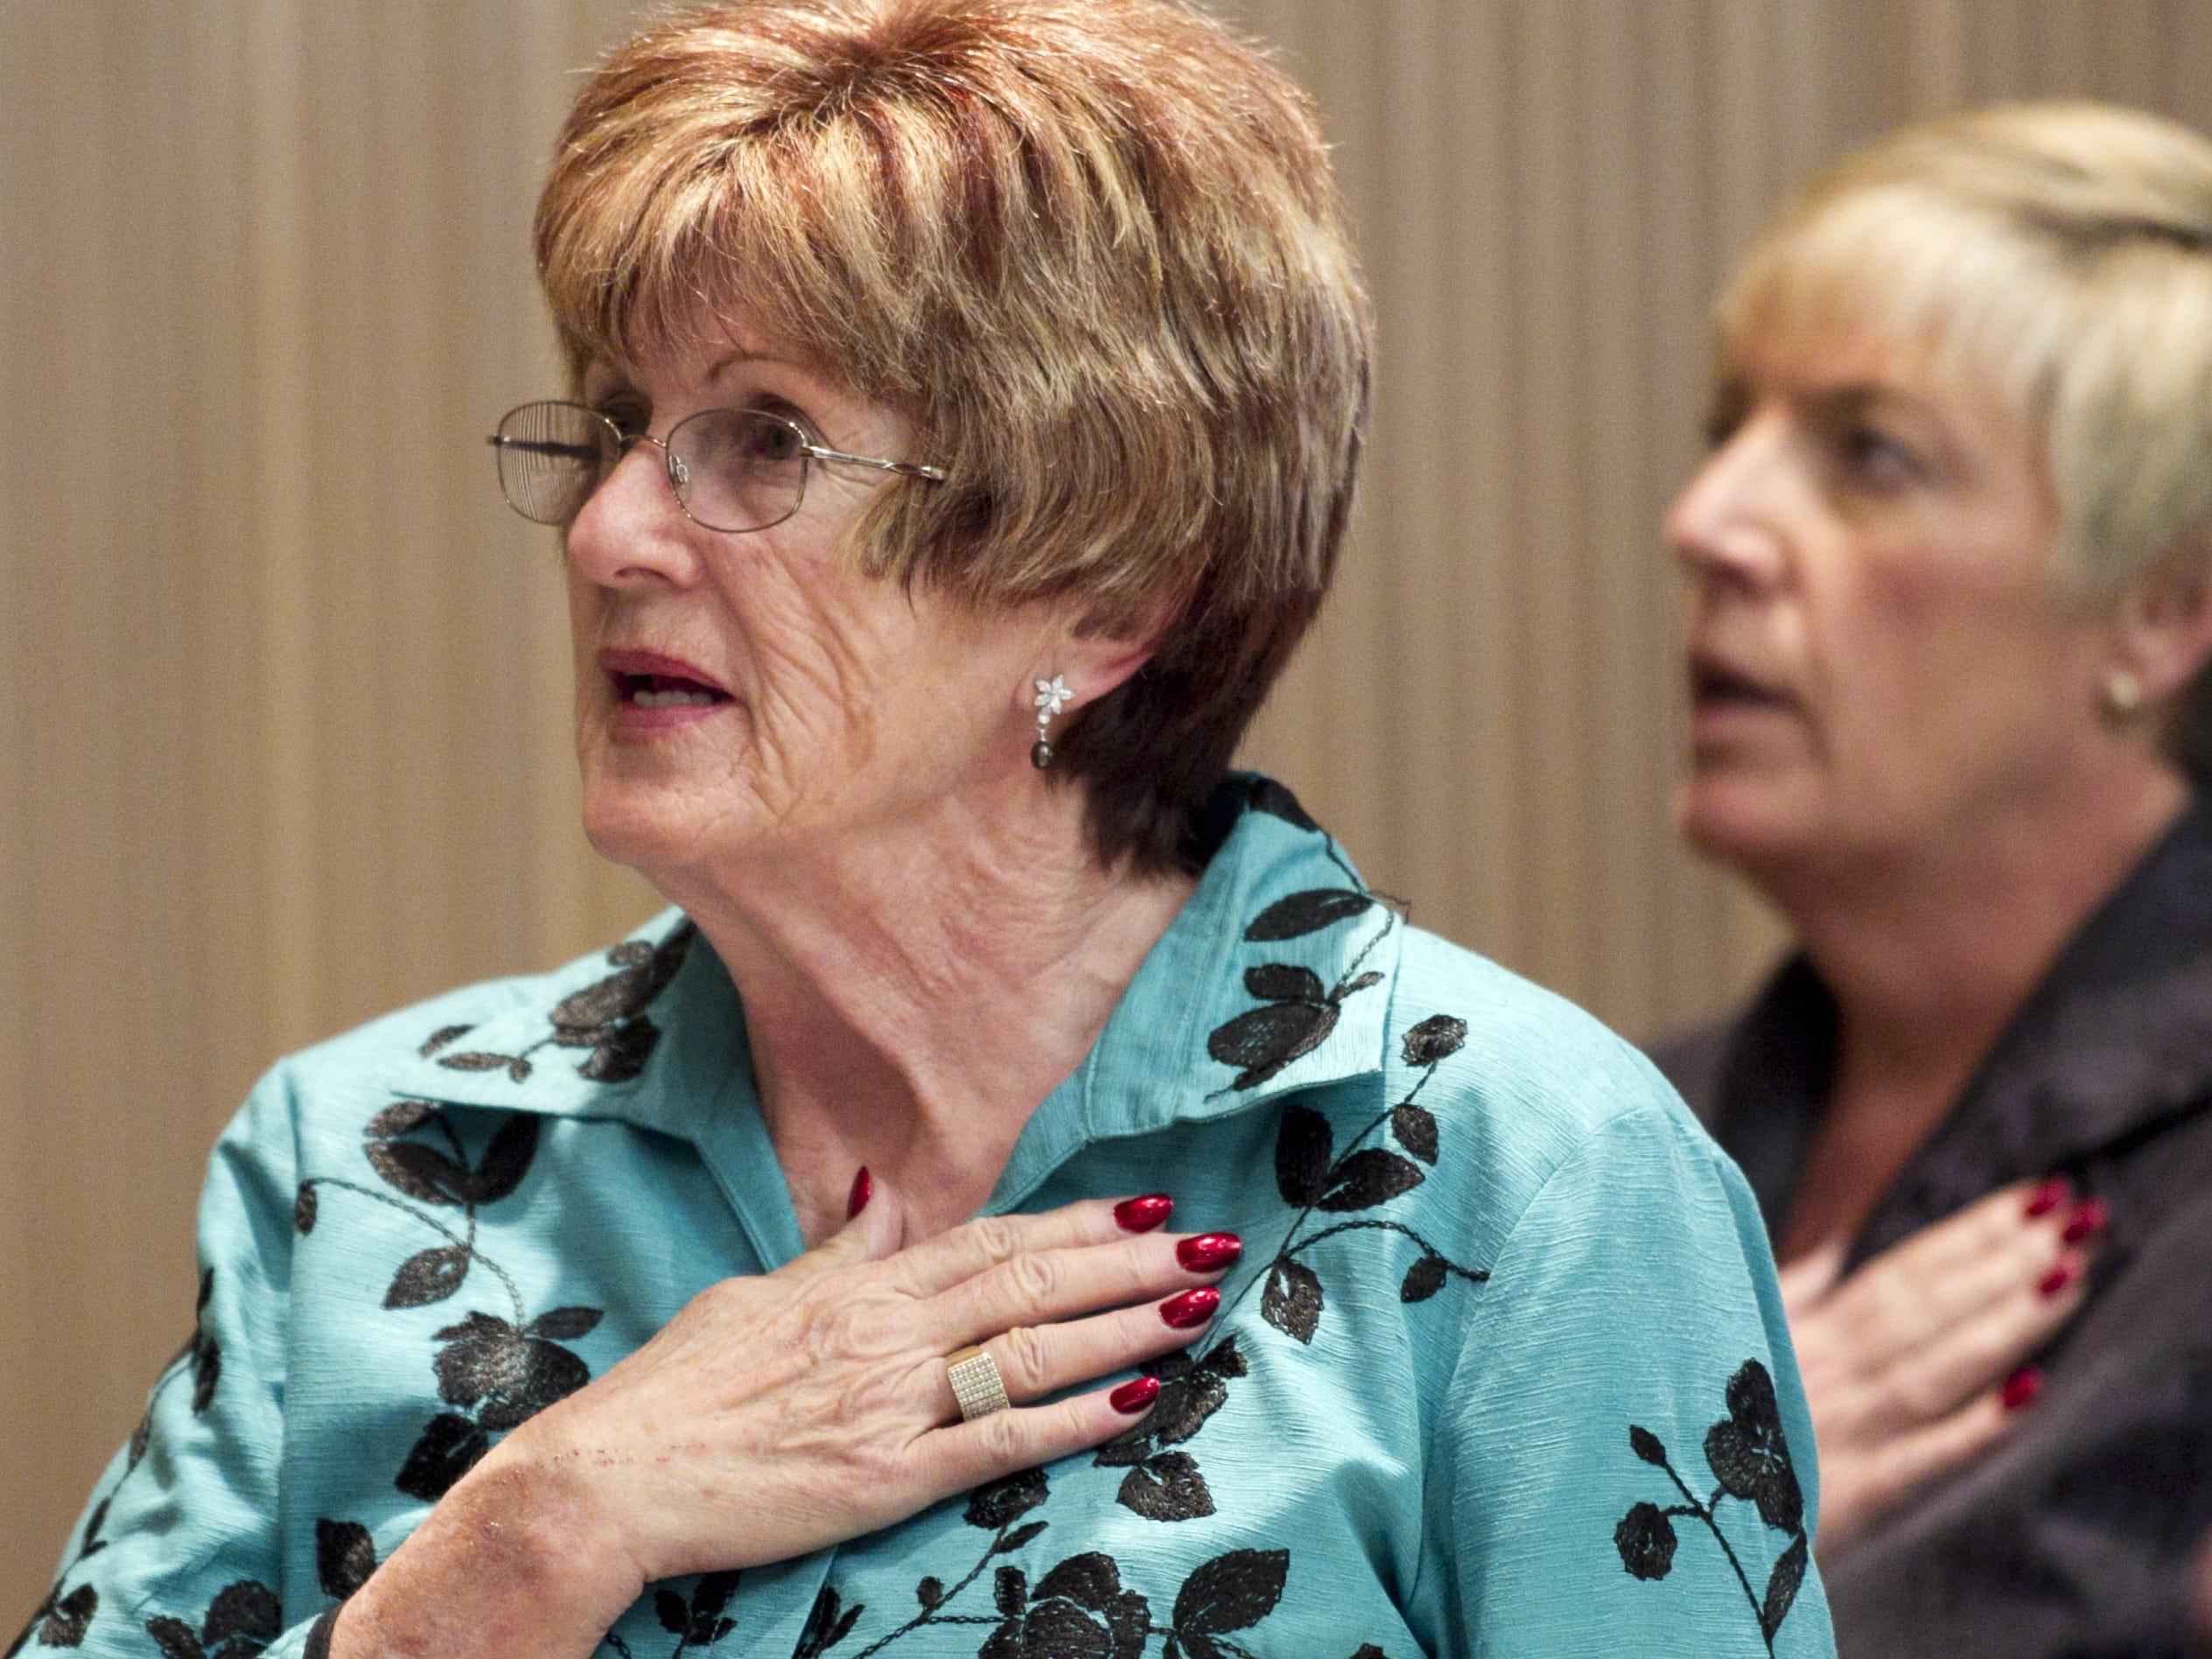 Phoenix Vice Mayor Thelda Williams, left, in 2011